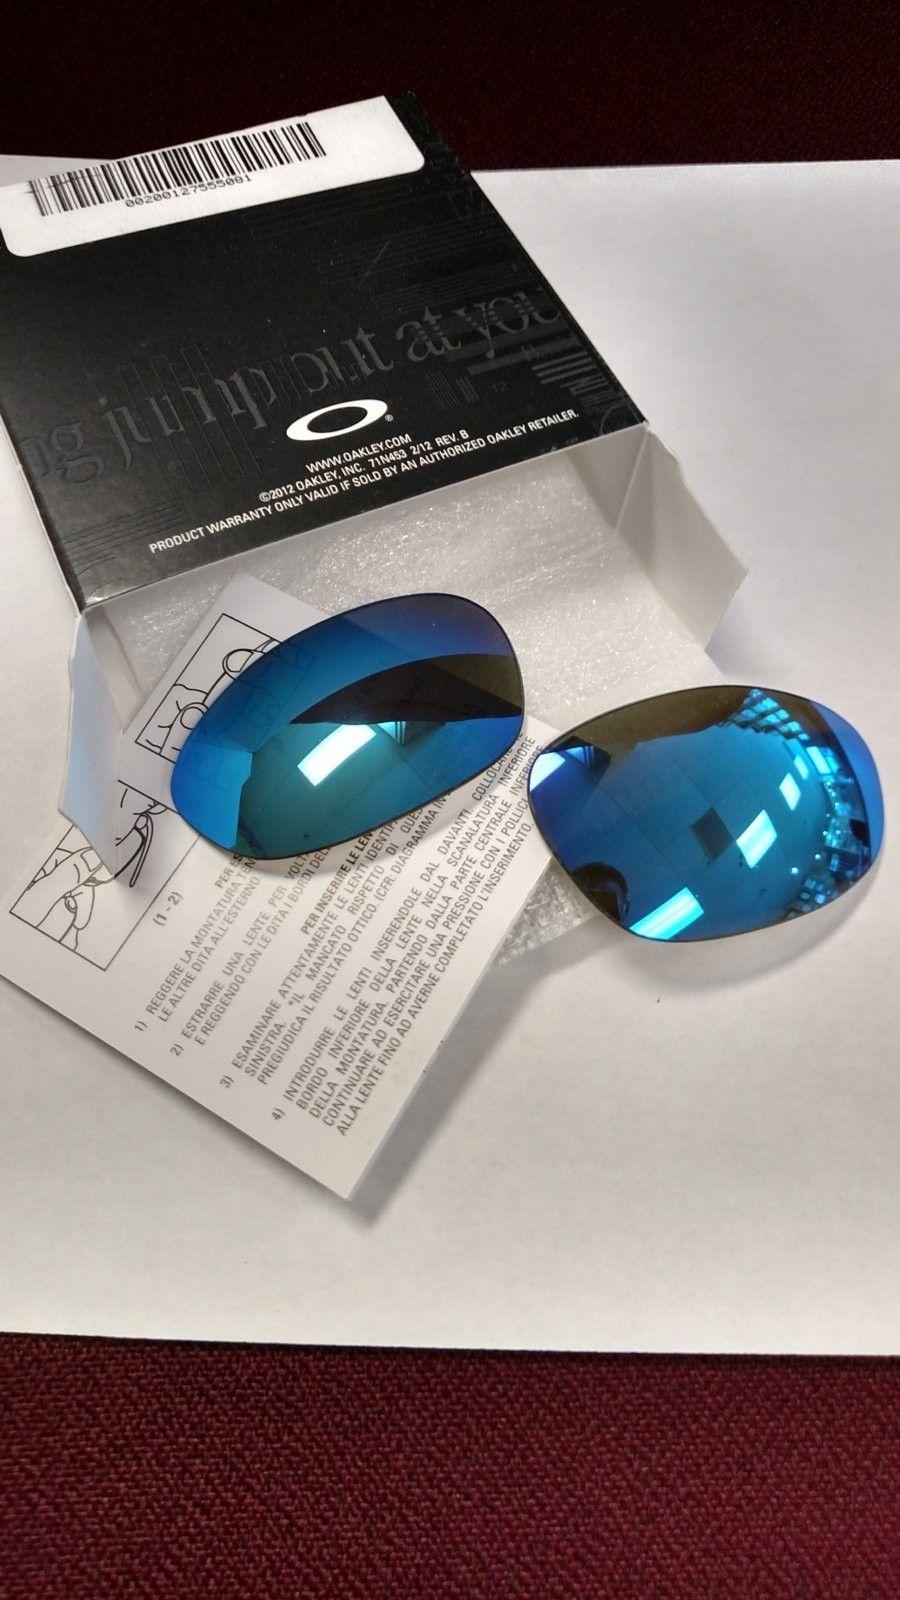 XX X-Metal Sapphire Iridium Polarized Custom Cut lenses - IMG_20160915_110558335_HDR.jpg